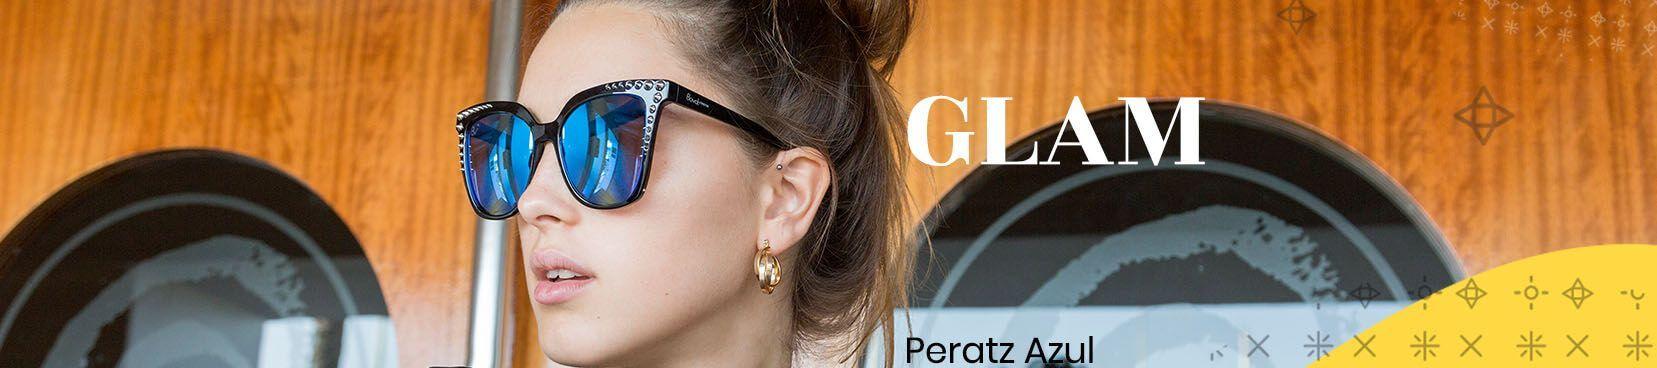 Gafas de sol glamourosas